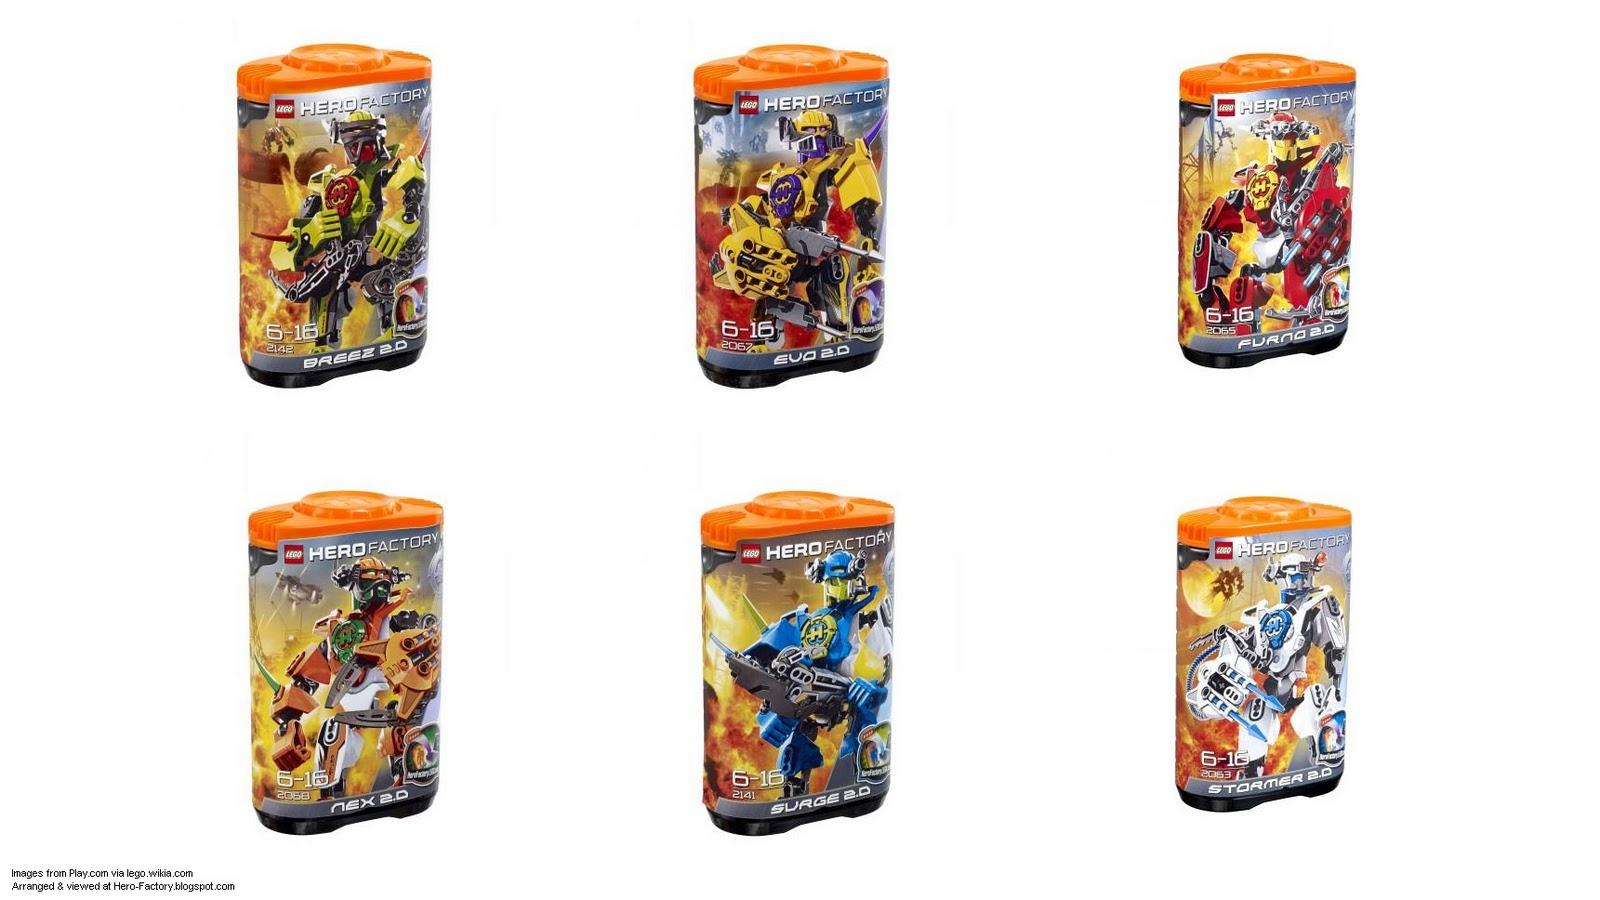 LEGO Hero Factory 2011: FINAL sets